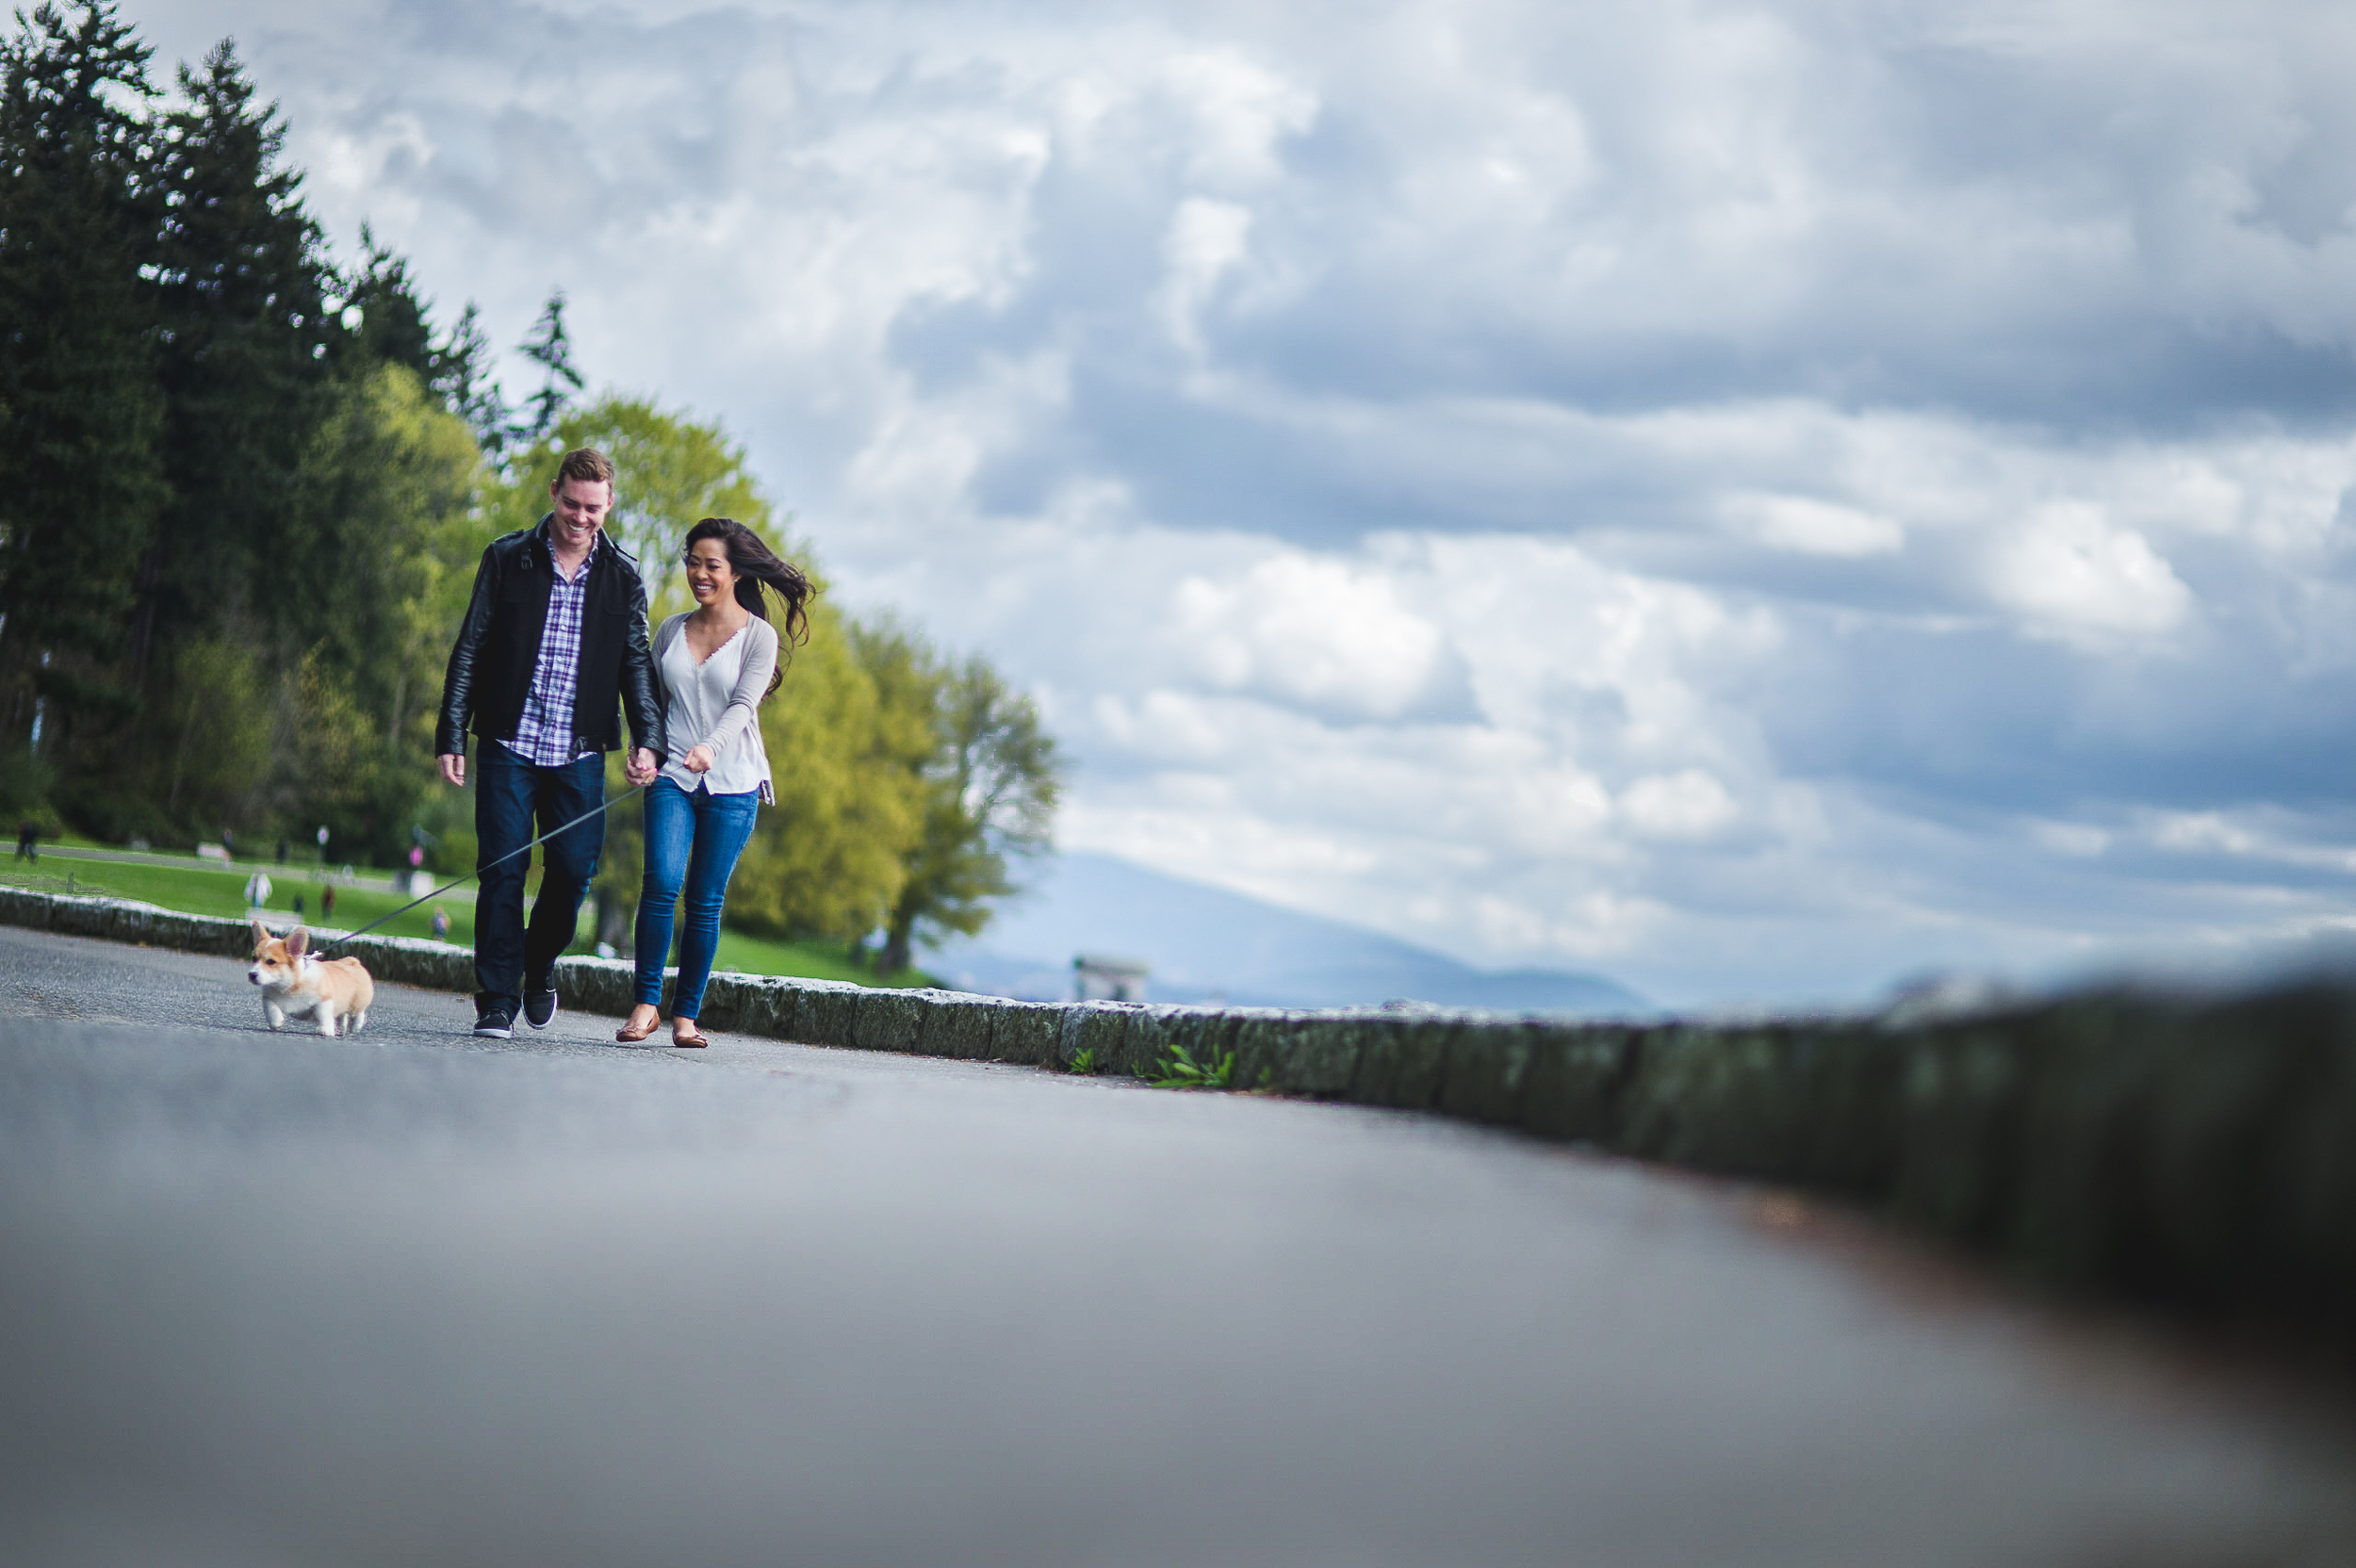 Vancouver Engagement Photographer by Mantas Kubilinskas-5.jpg